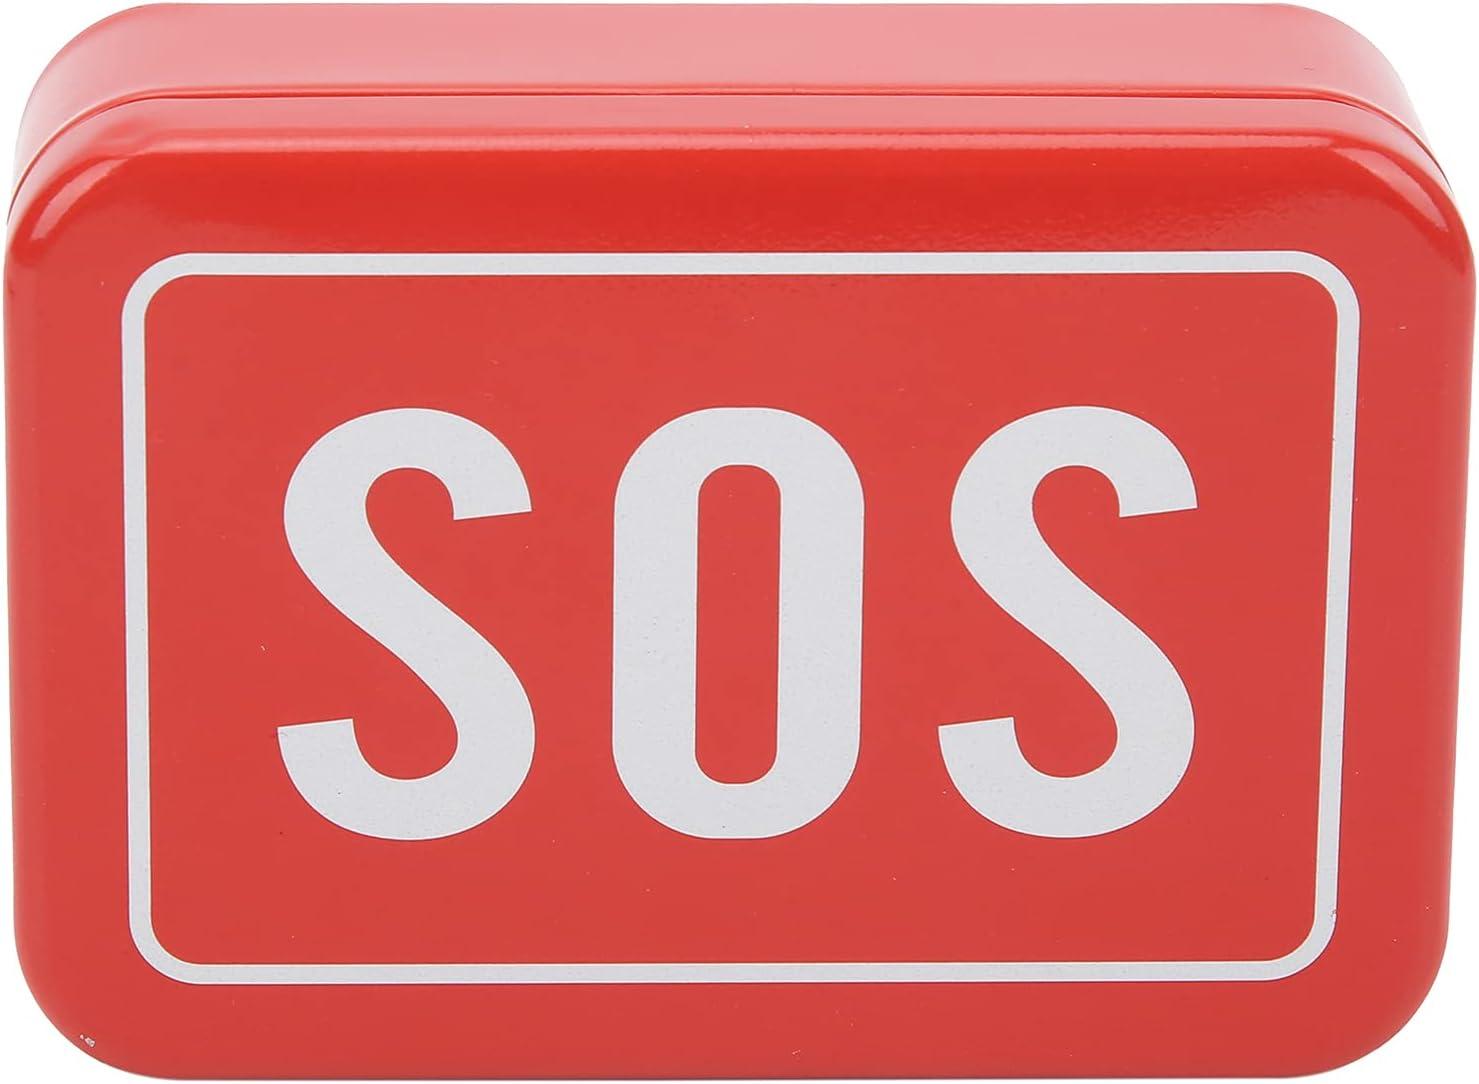 01 SOS NEW Case Strong Atlanta Mall Portable Durable Mu Practical Lifesaving Box